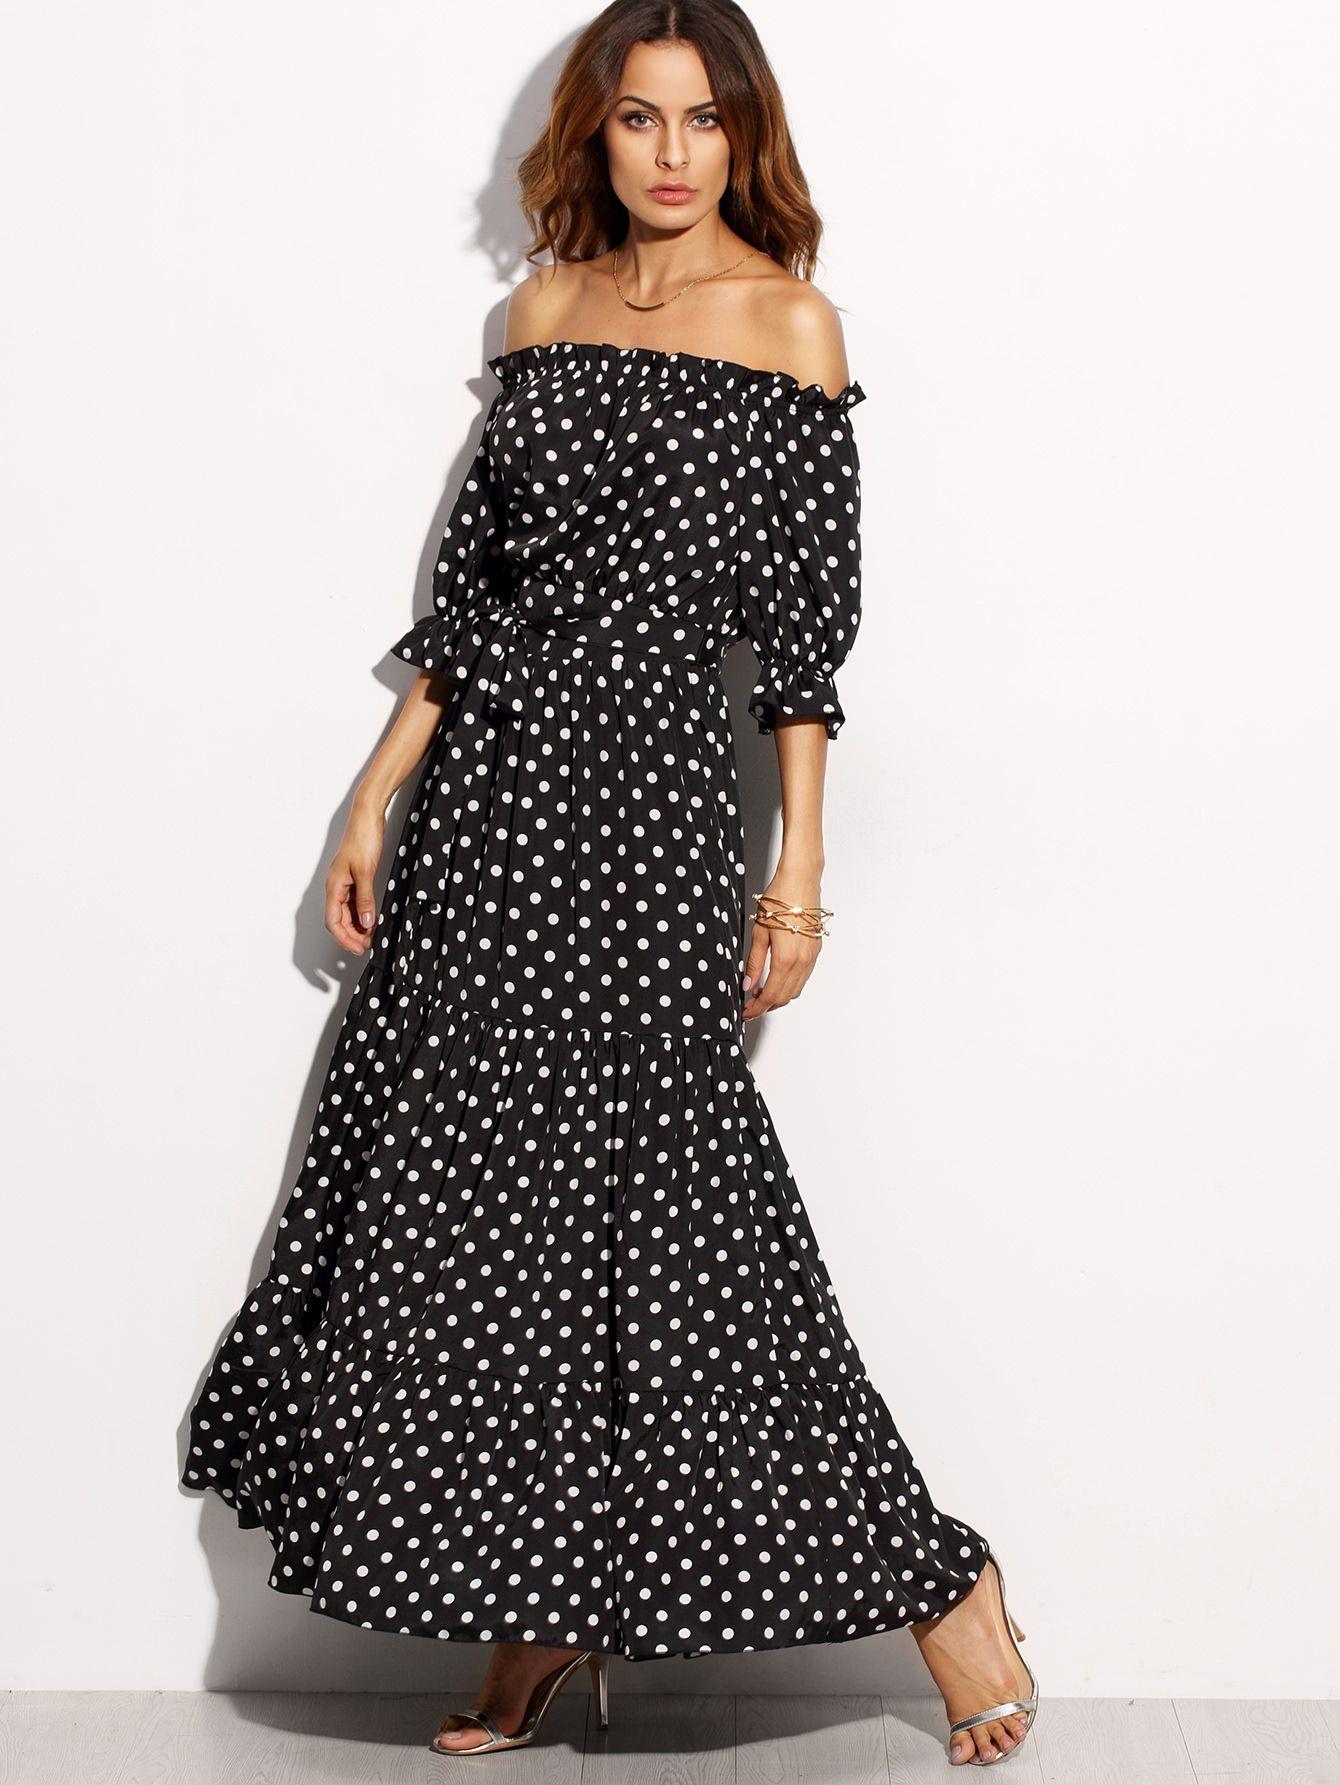 36d8df4829295 Shop Polka Dot Bardot Neckline Tie Waist Dress online. SheIn offers ...